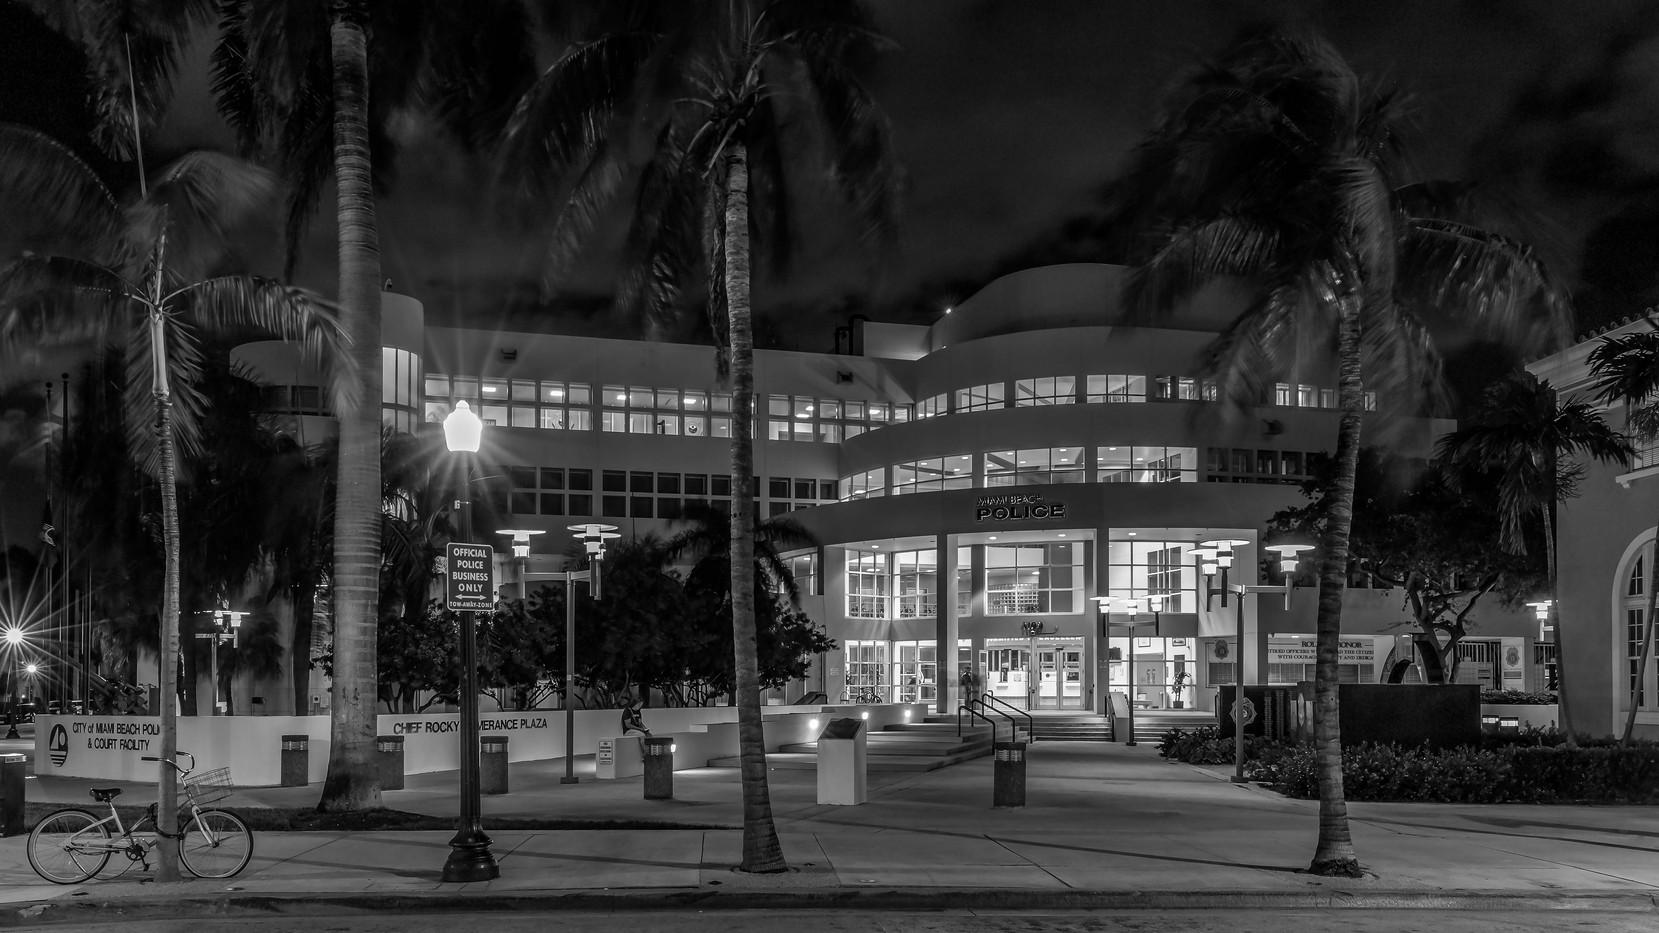 Miami Dade Police Department